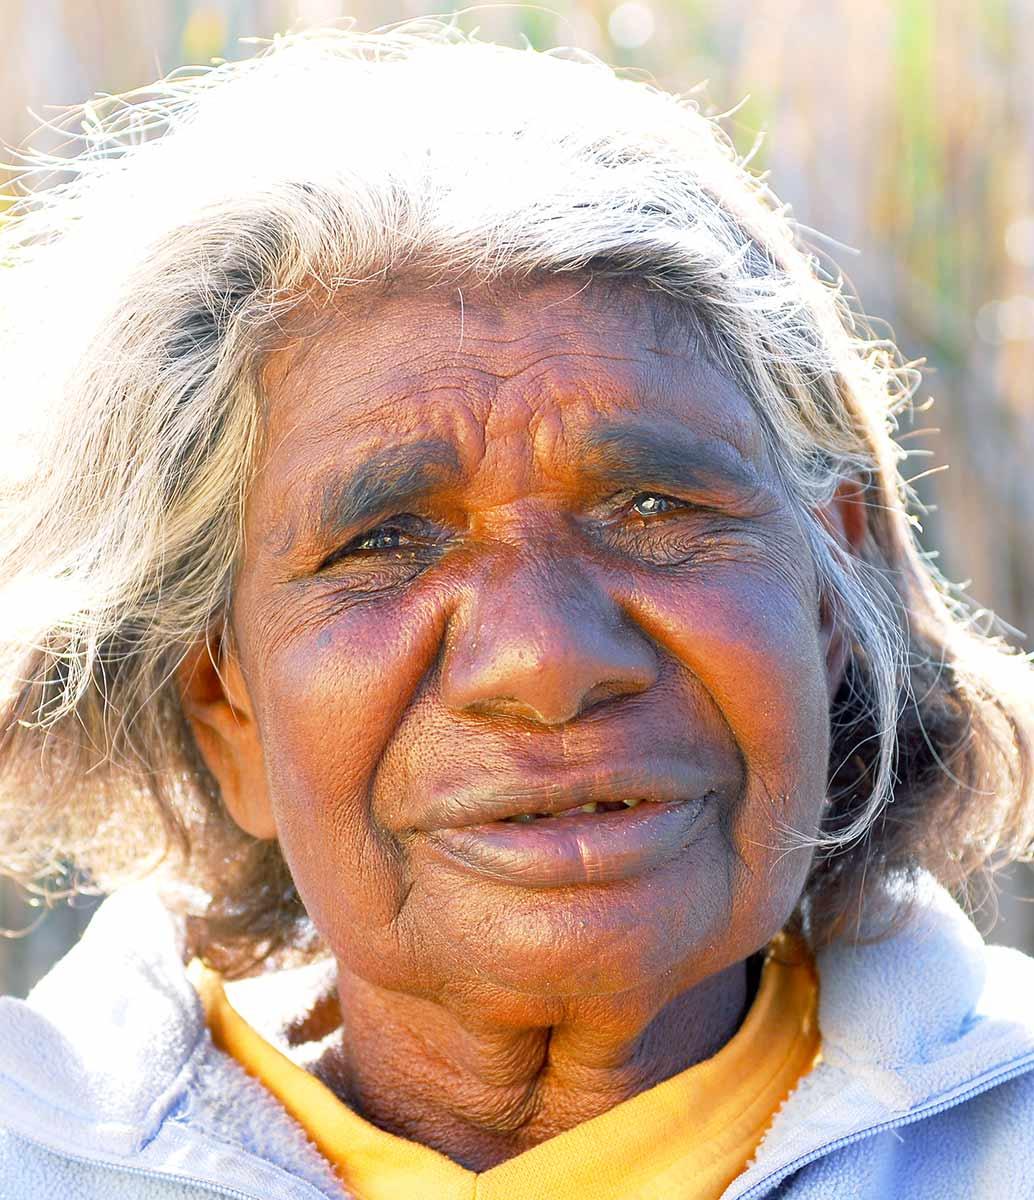 Portrait of Yikartu Bumba. - click to view larger image